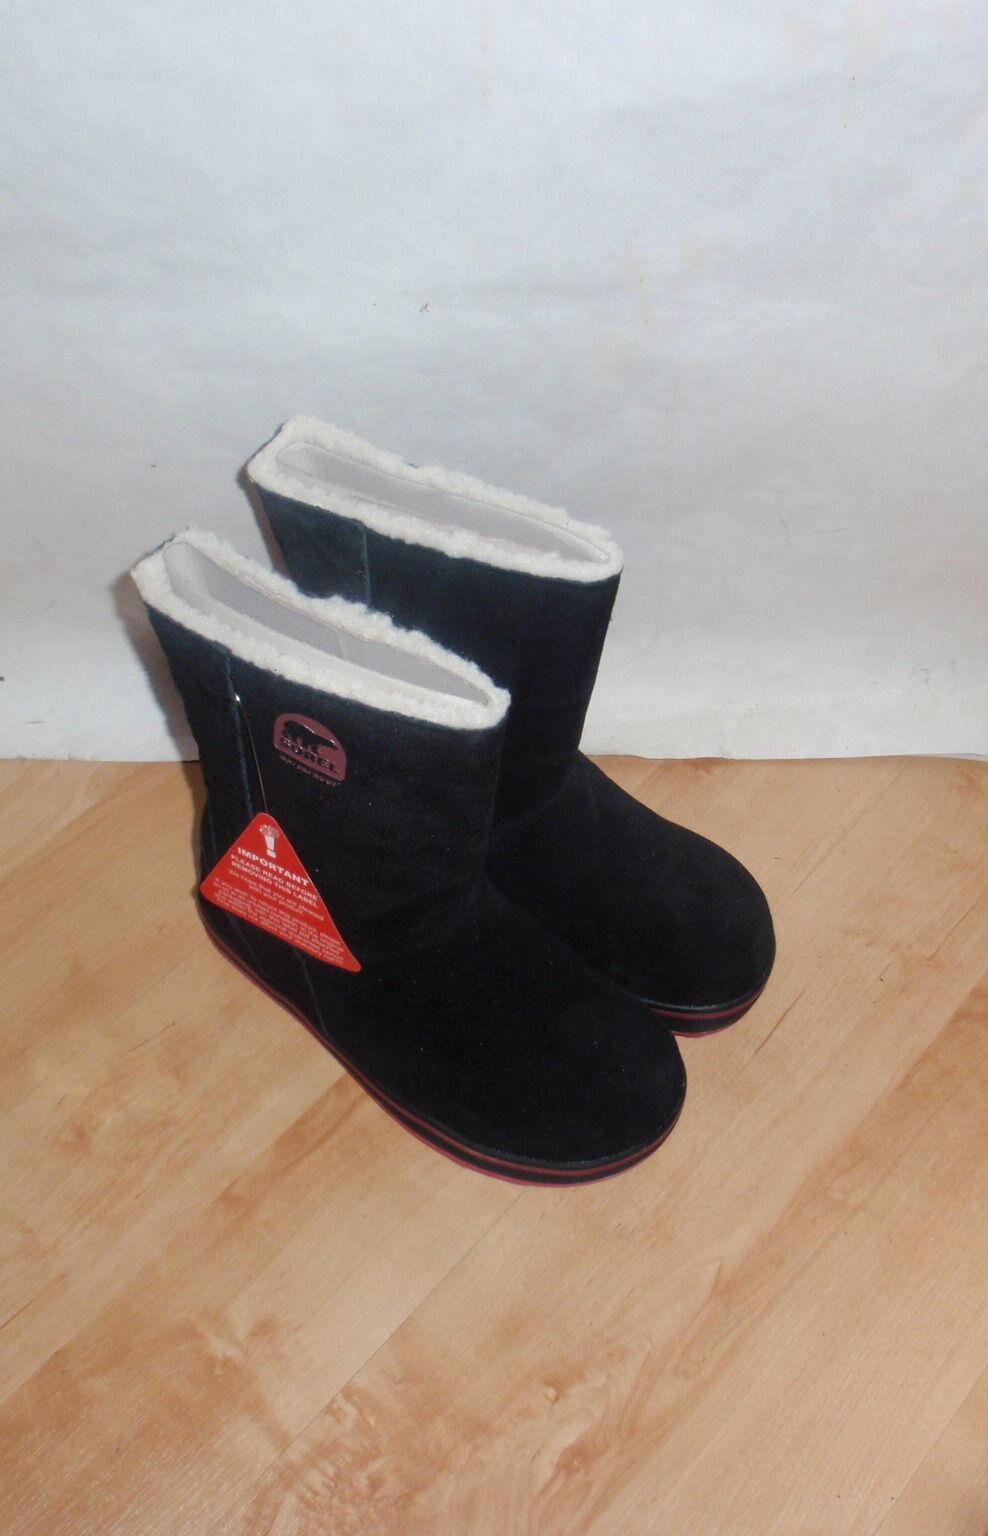 NIB Sorel ladies 'GLACY' suede warm boots lined mid calf winter boots warm size UK 3 EU 36 ecb1ab